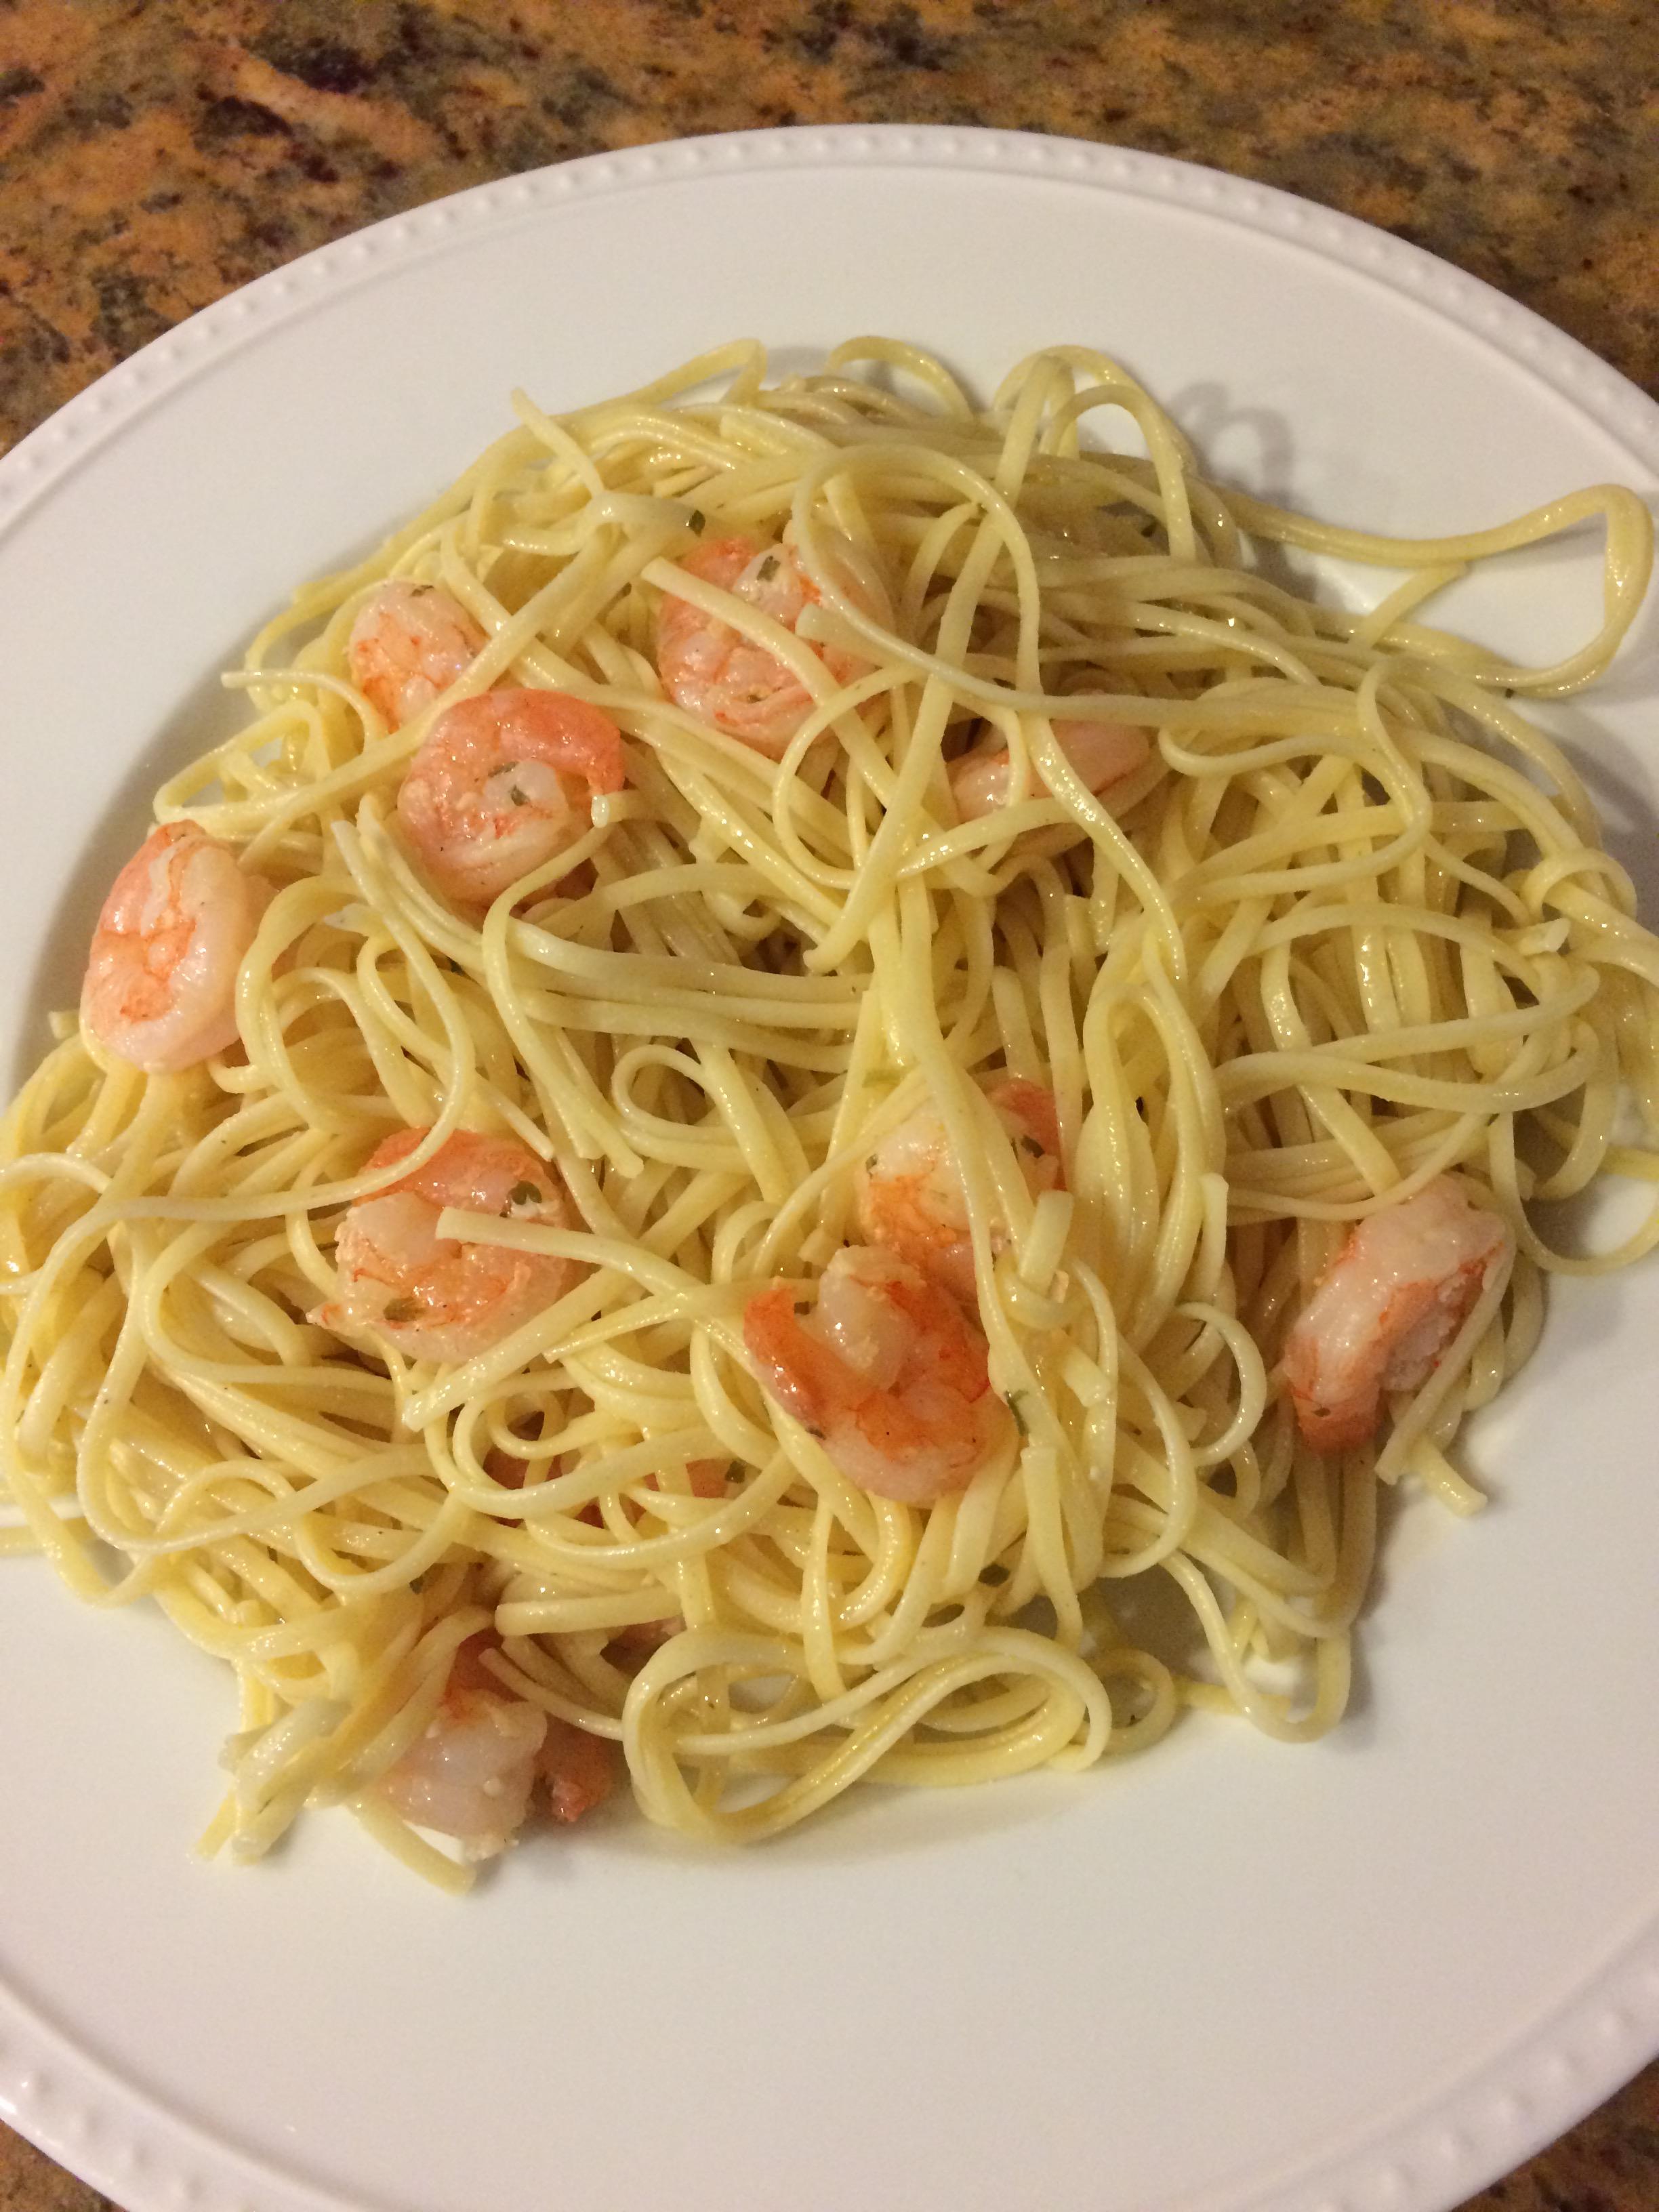 Ina Garten Shrimp Linguine Home Sweet Mama Mia Sharing Ideas On Organizing Recipes